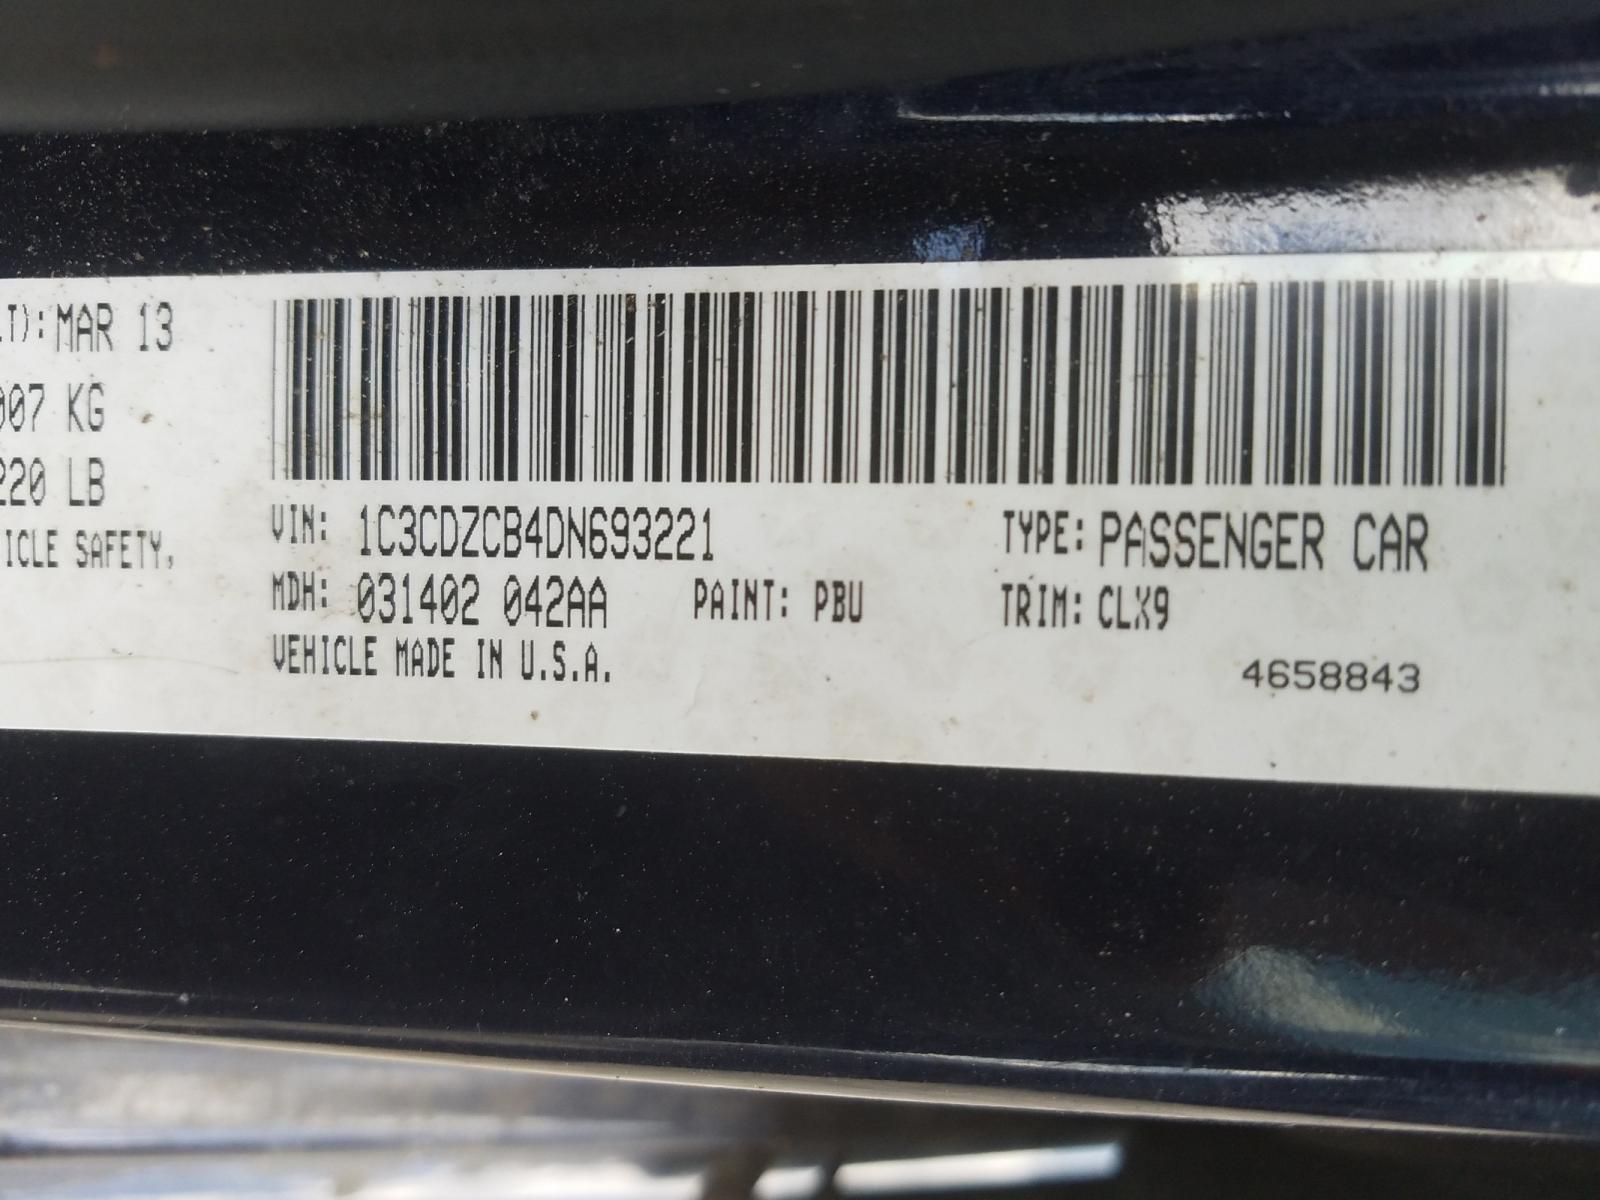 1C3CDZCB4DN693221 - 2013 Dodge Avenger Sx 2.4L